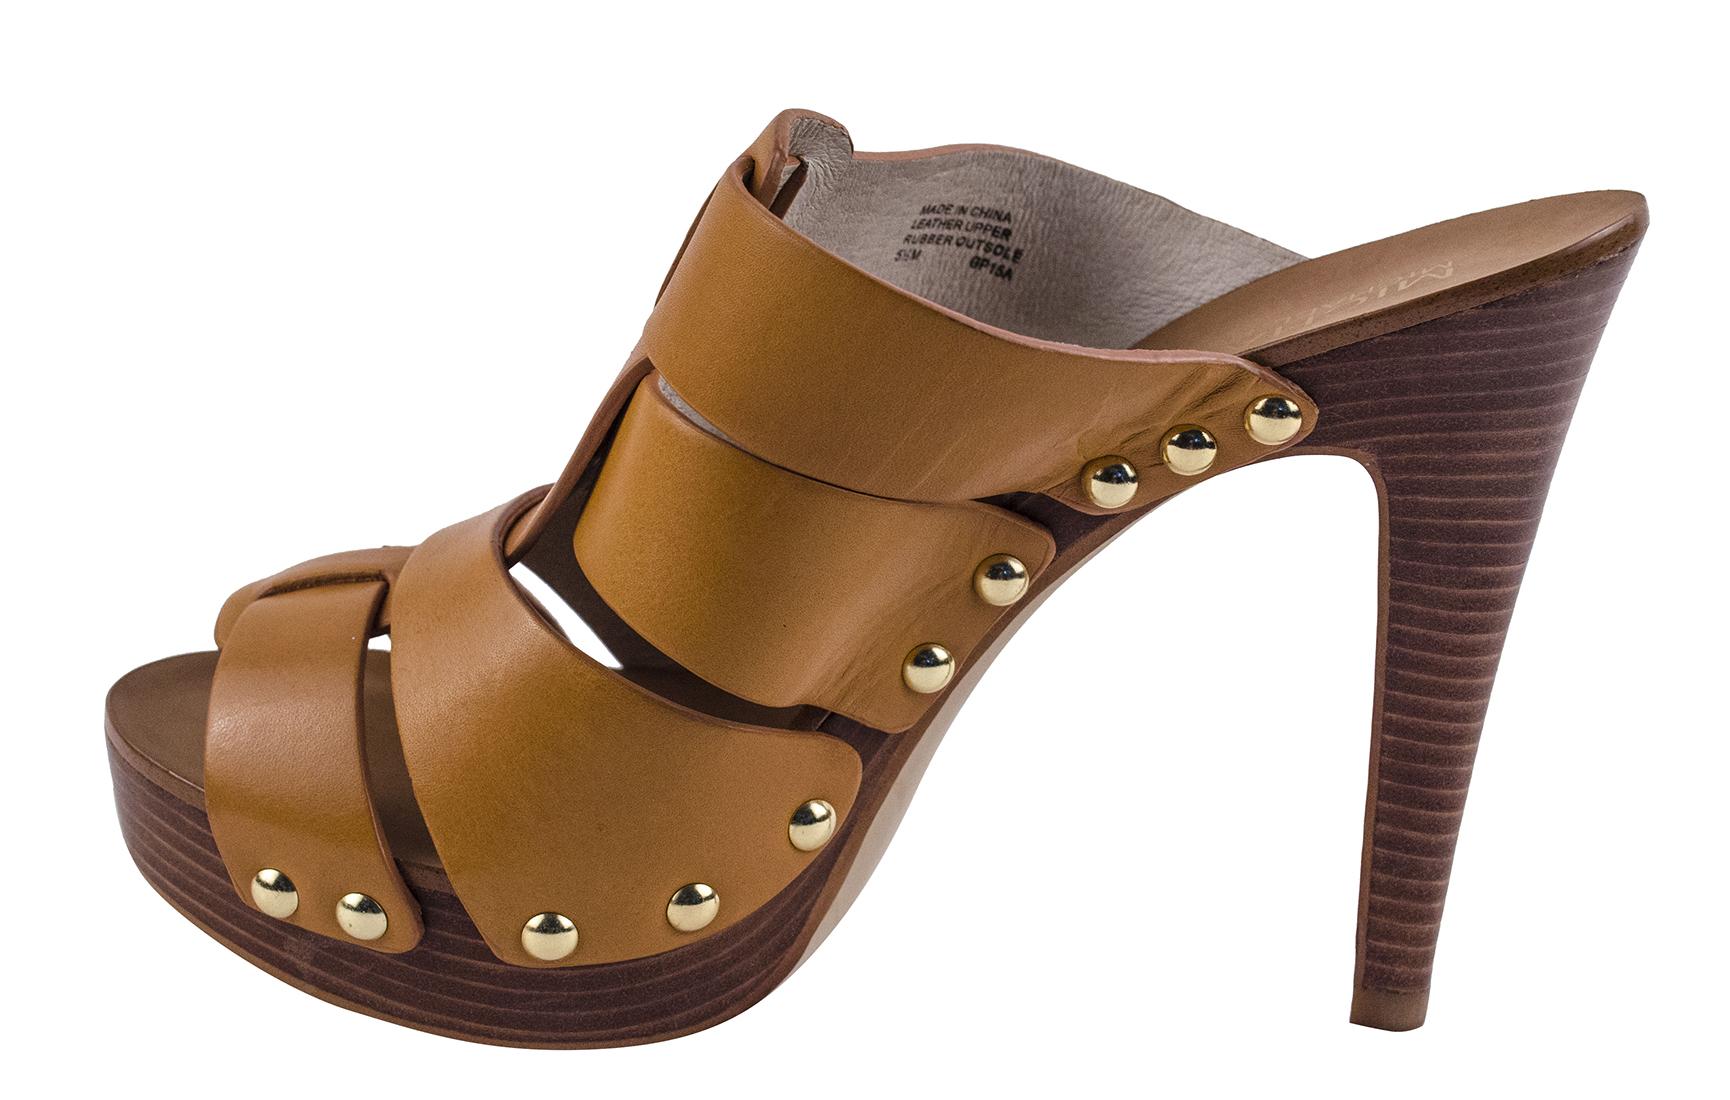 Michael Kors Women's Somerly High Heel Mule Sandals Shoes ...